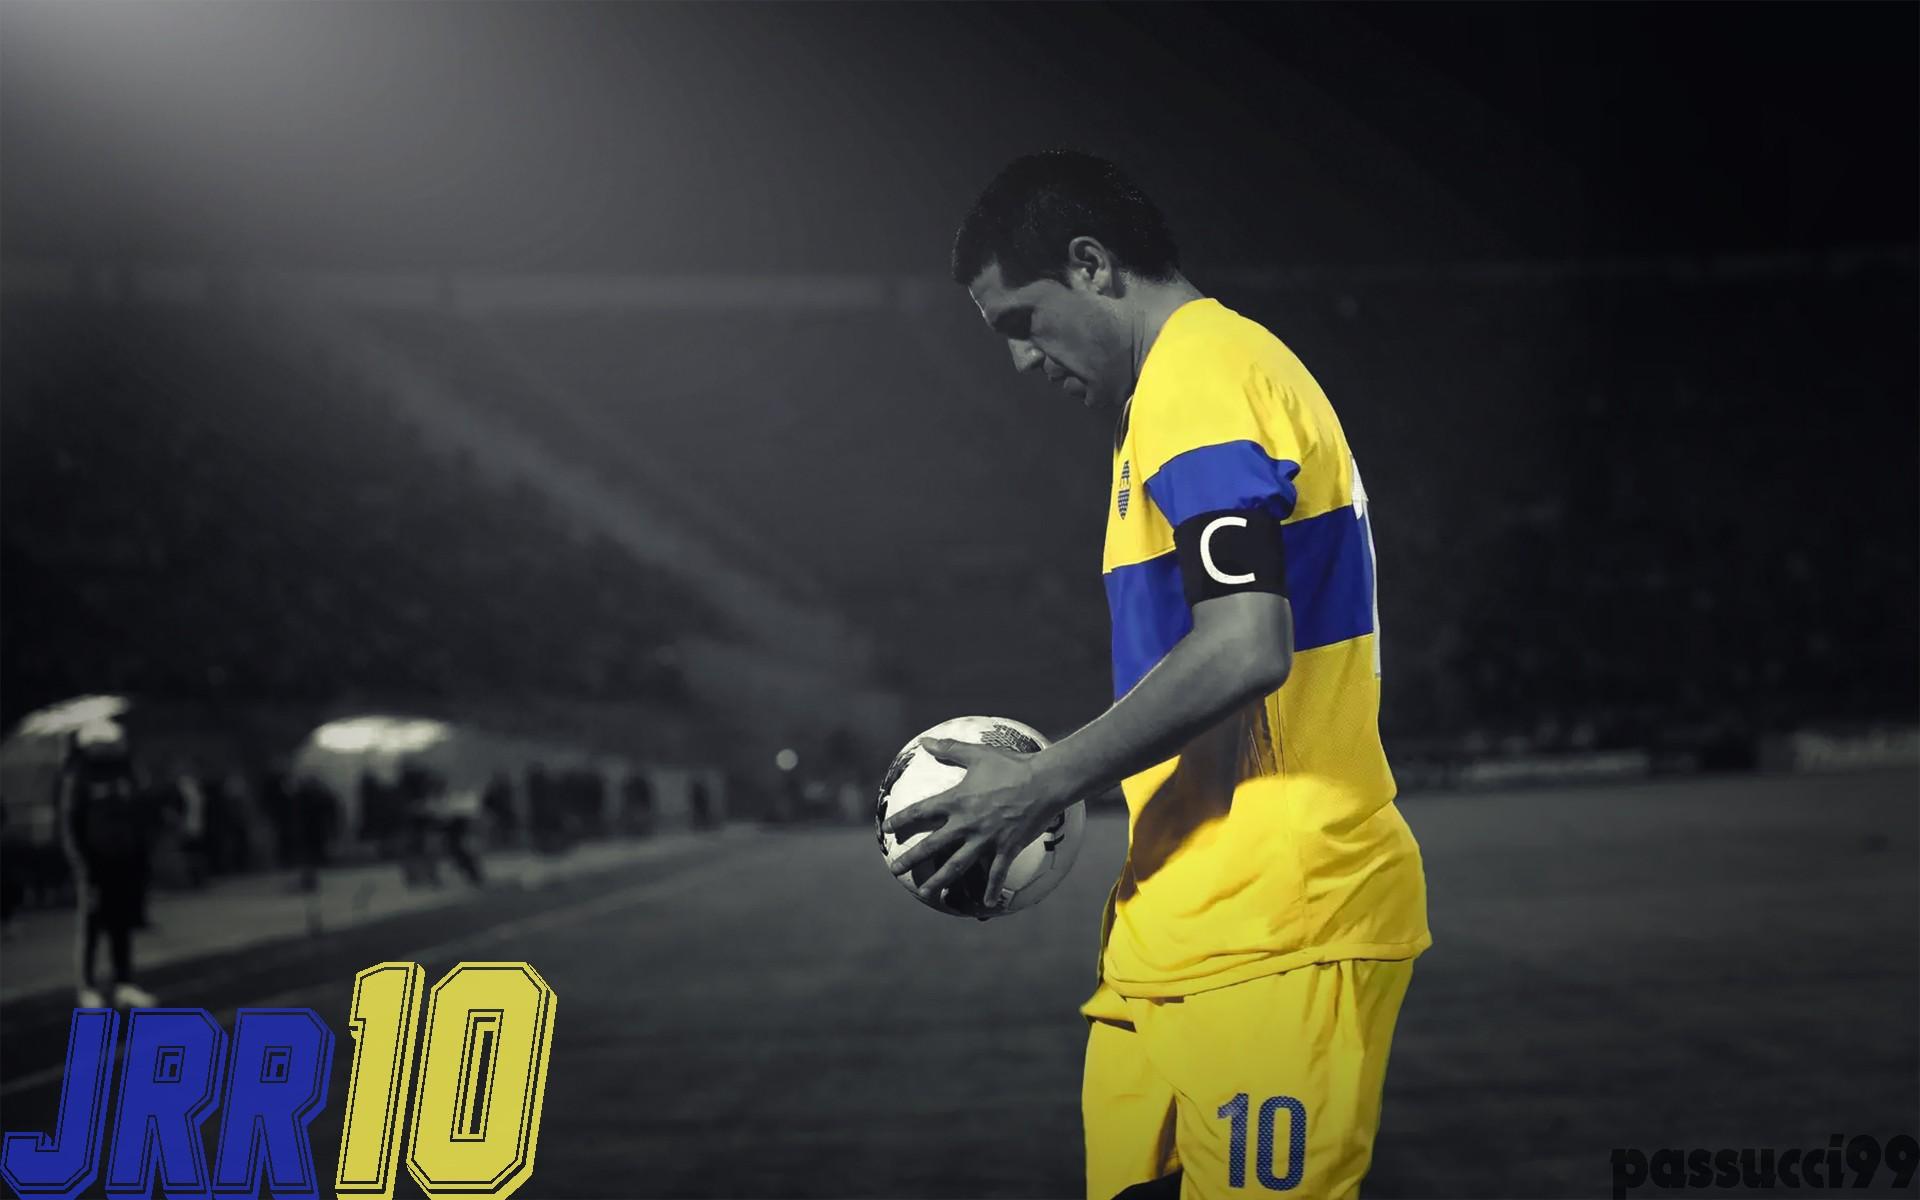 Hintergrundbilder : Sport, Selektive Färbung, Gelb, Fußball, Ball ...